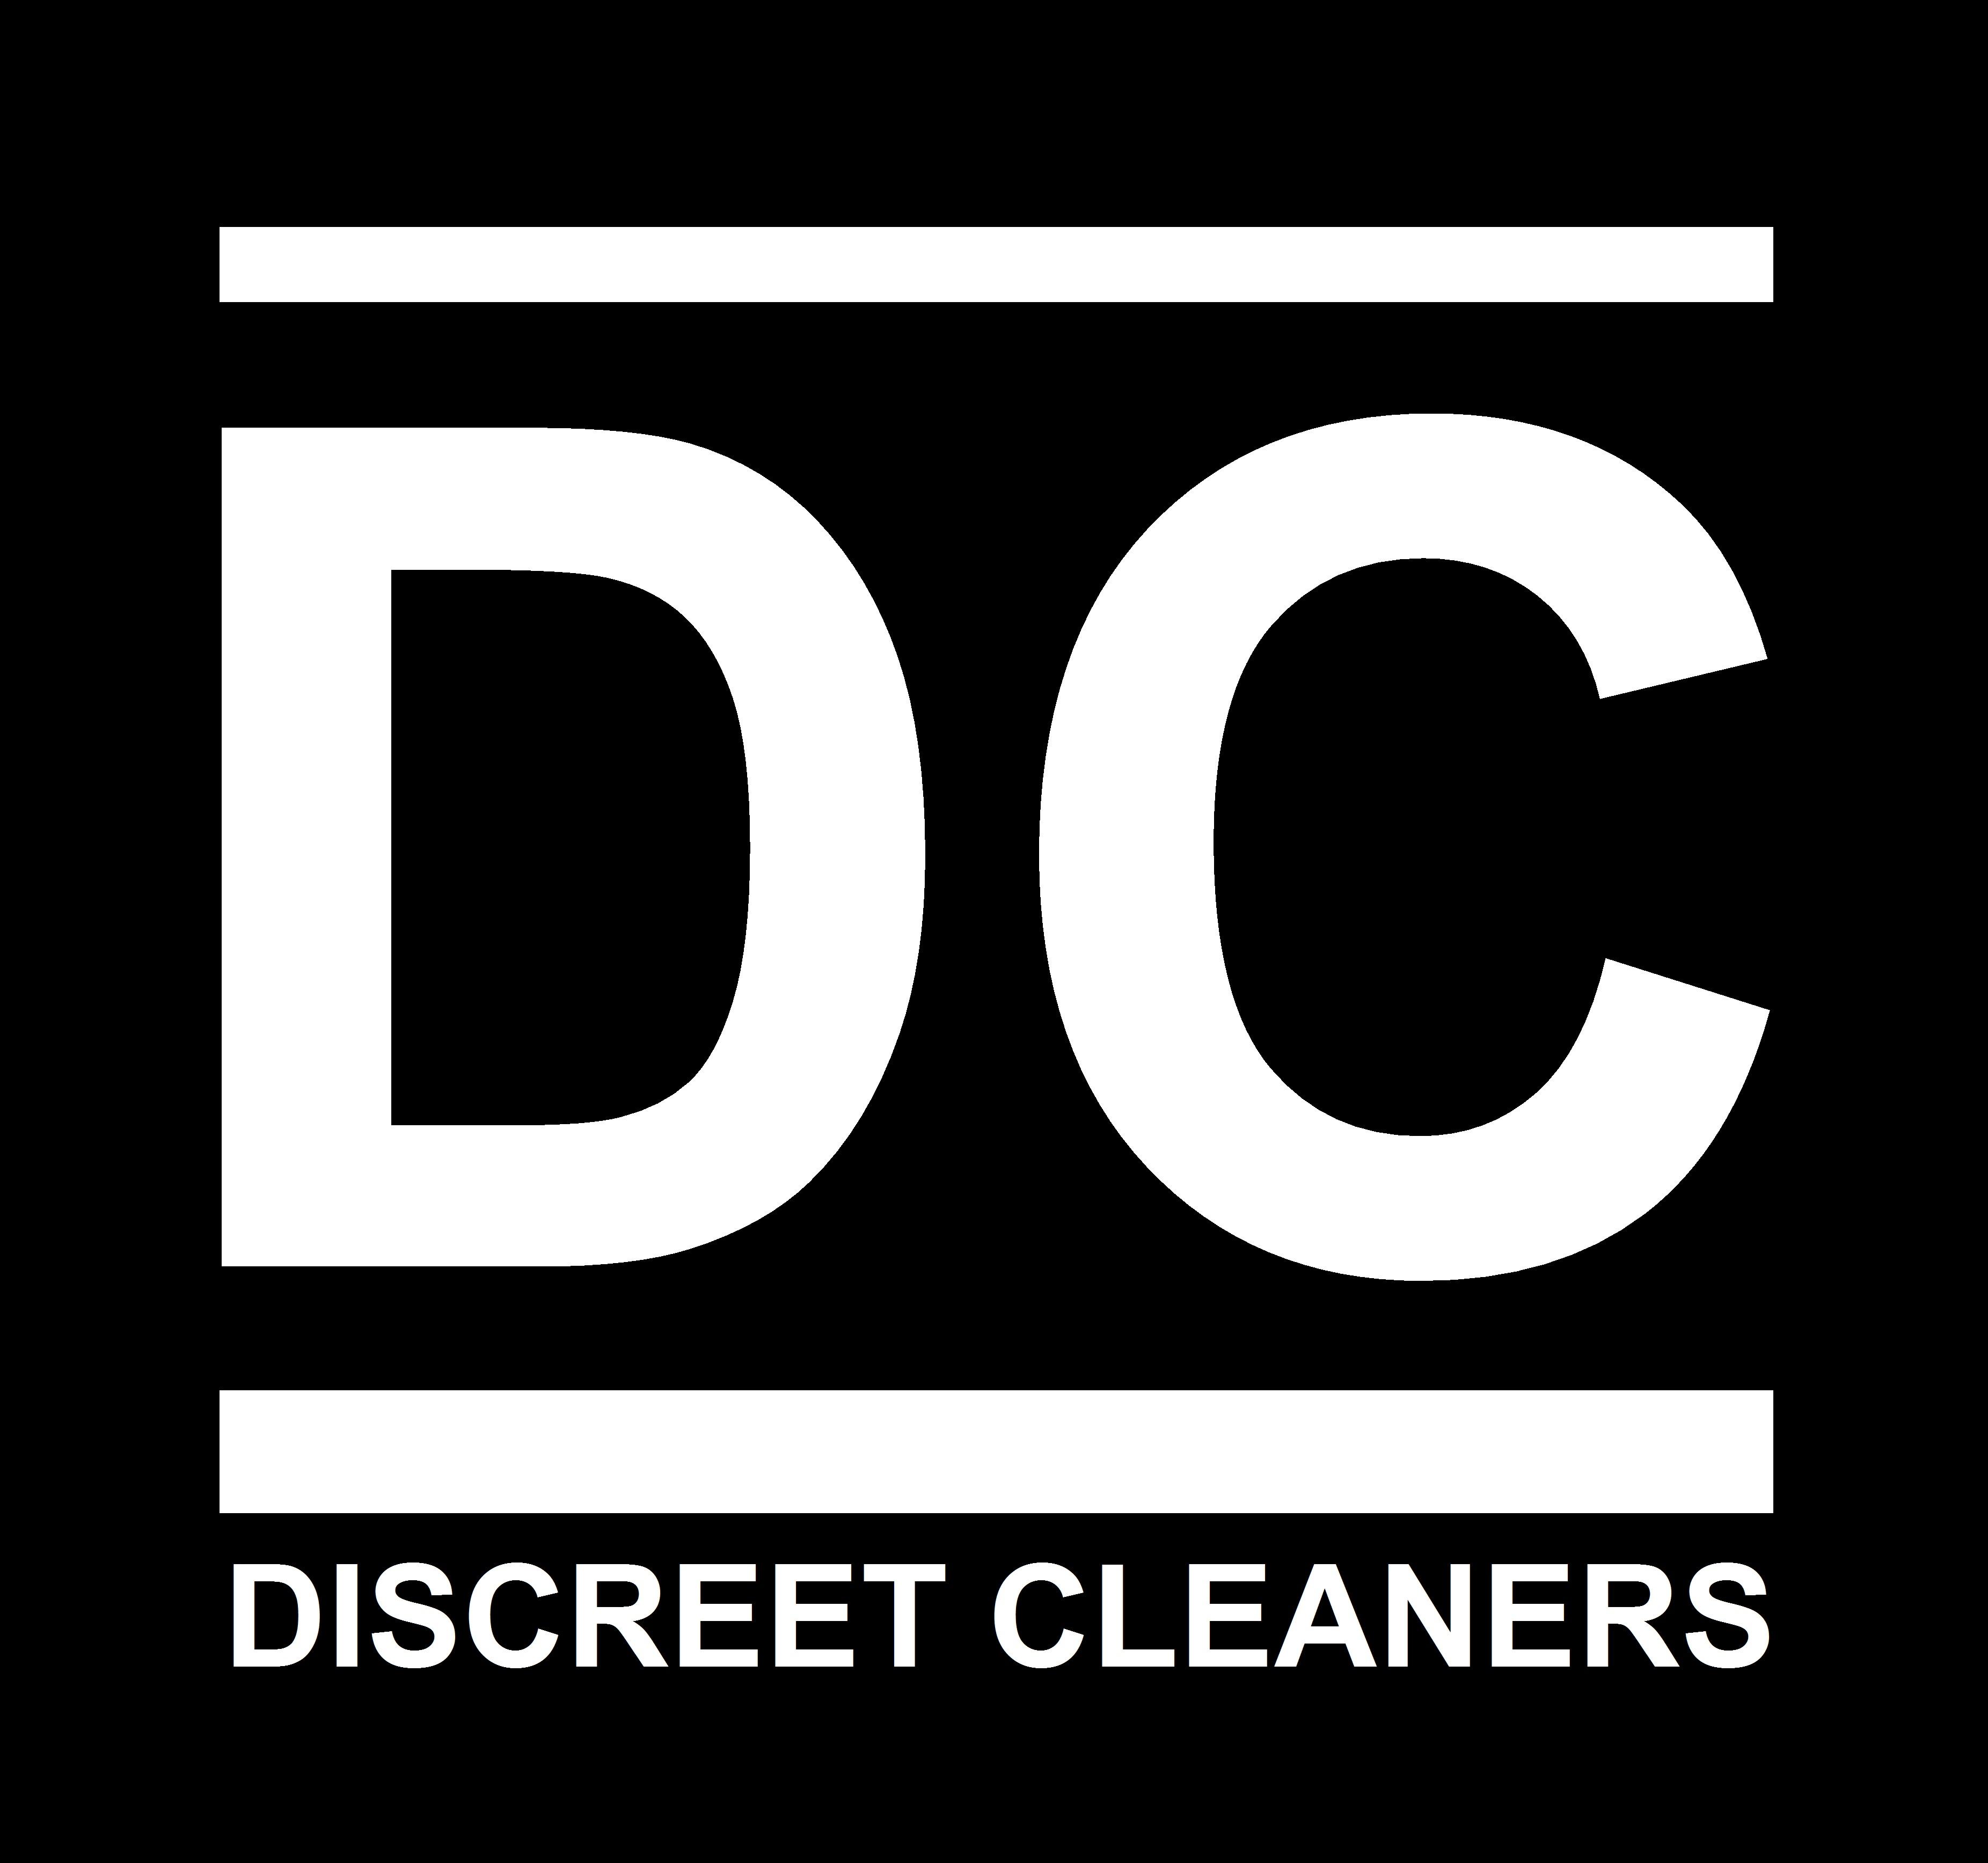 DISCREET CLEANERS